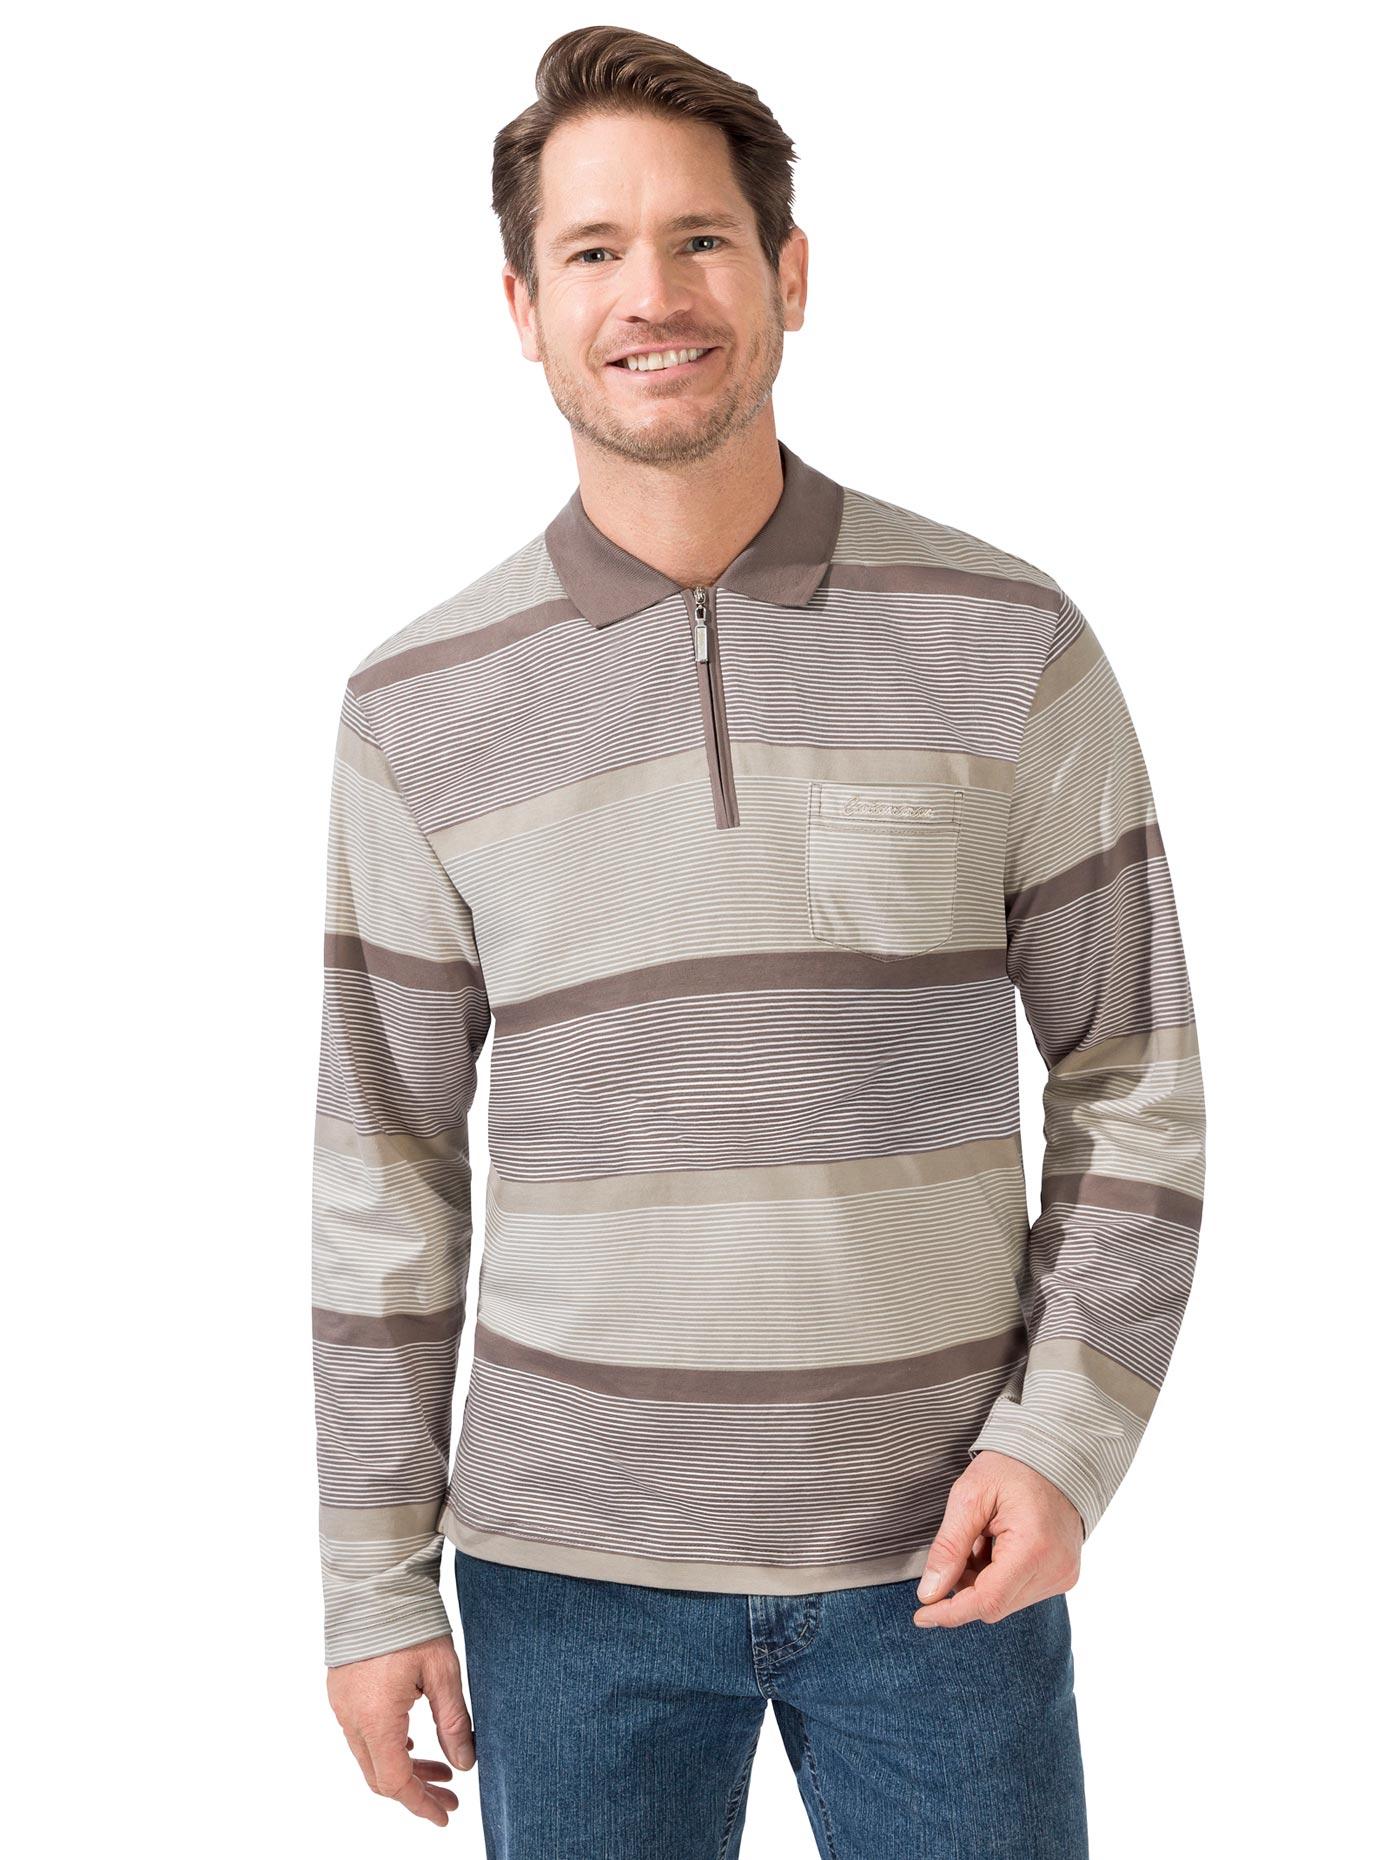 Langarm-Poloshirt braun Herren Langarm Shirts Poloshirts